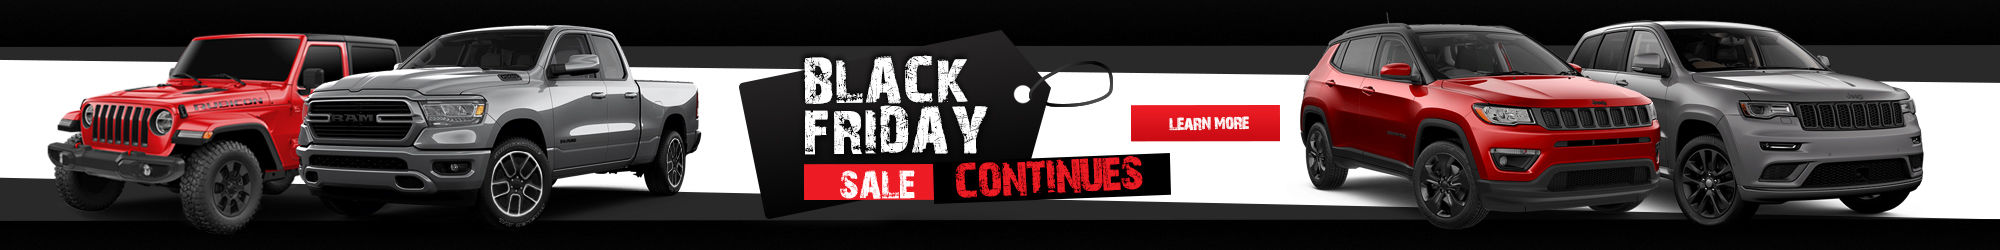 Black Friday sales! (CONTINUES)